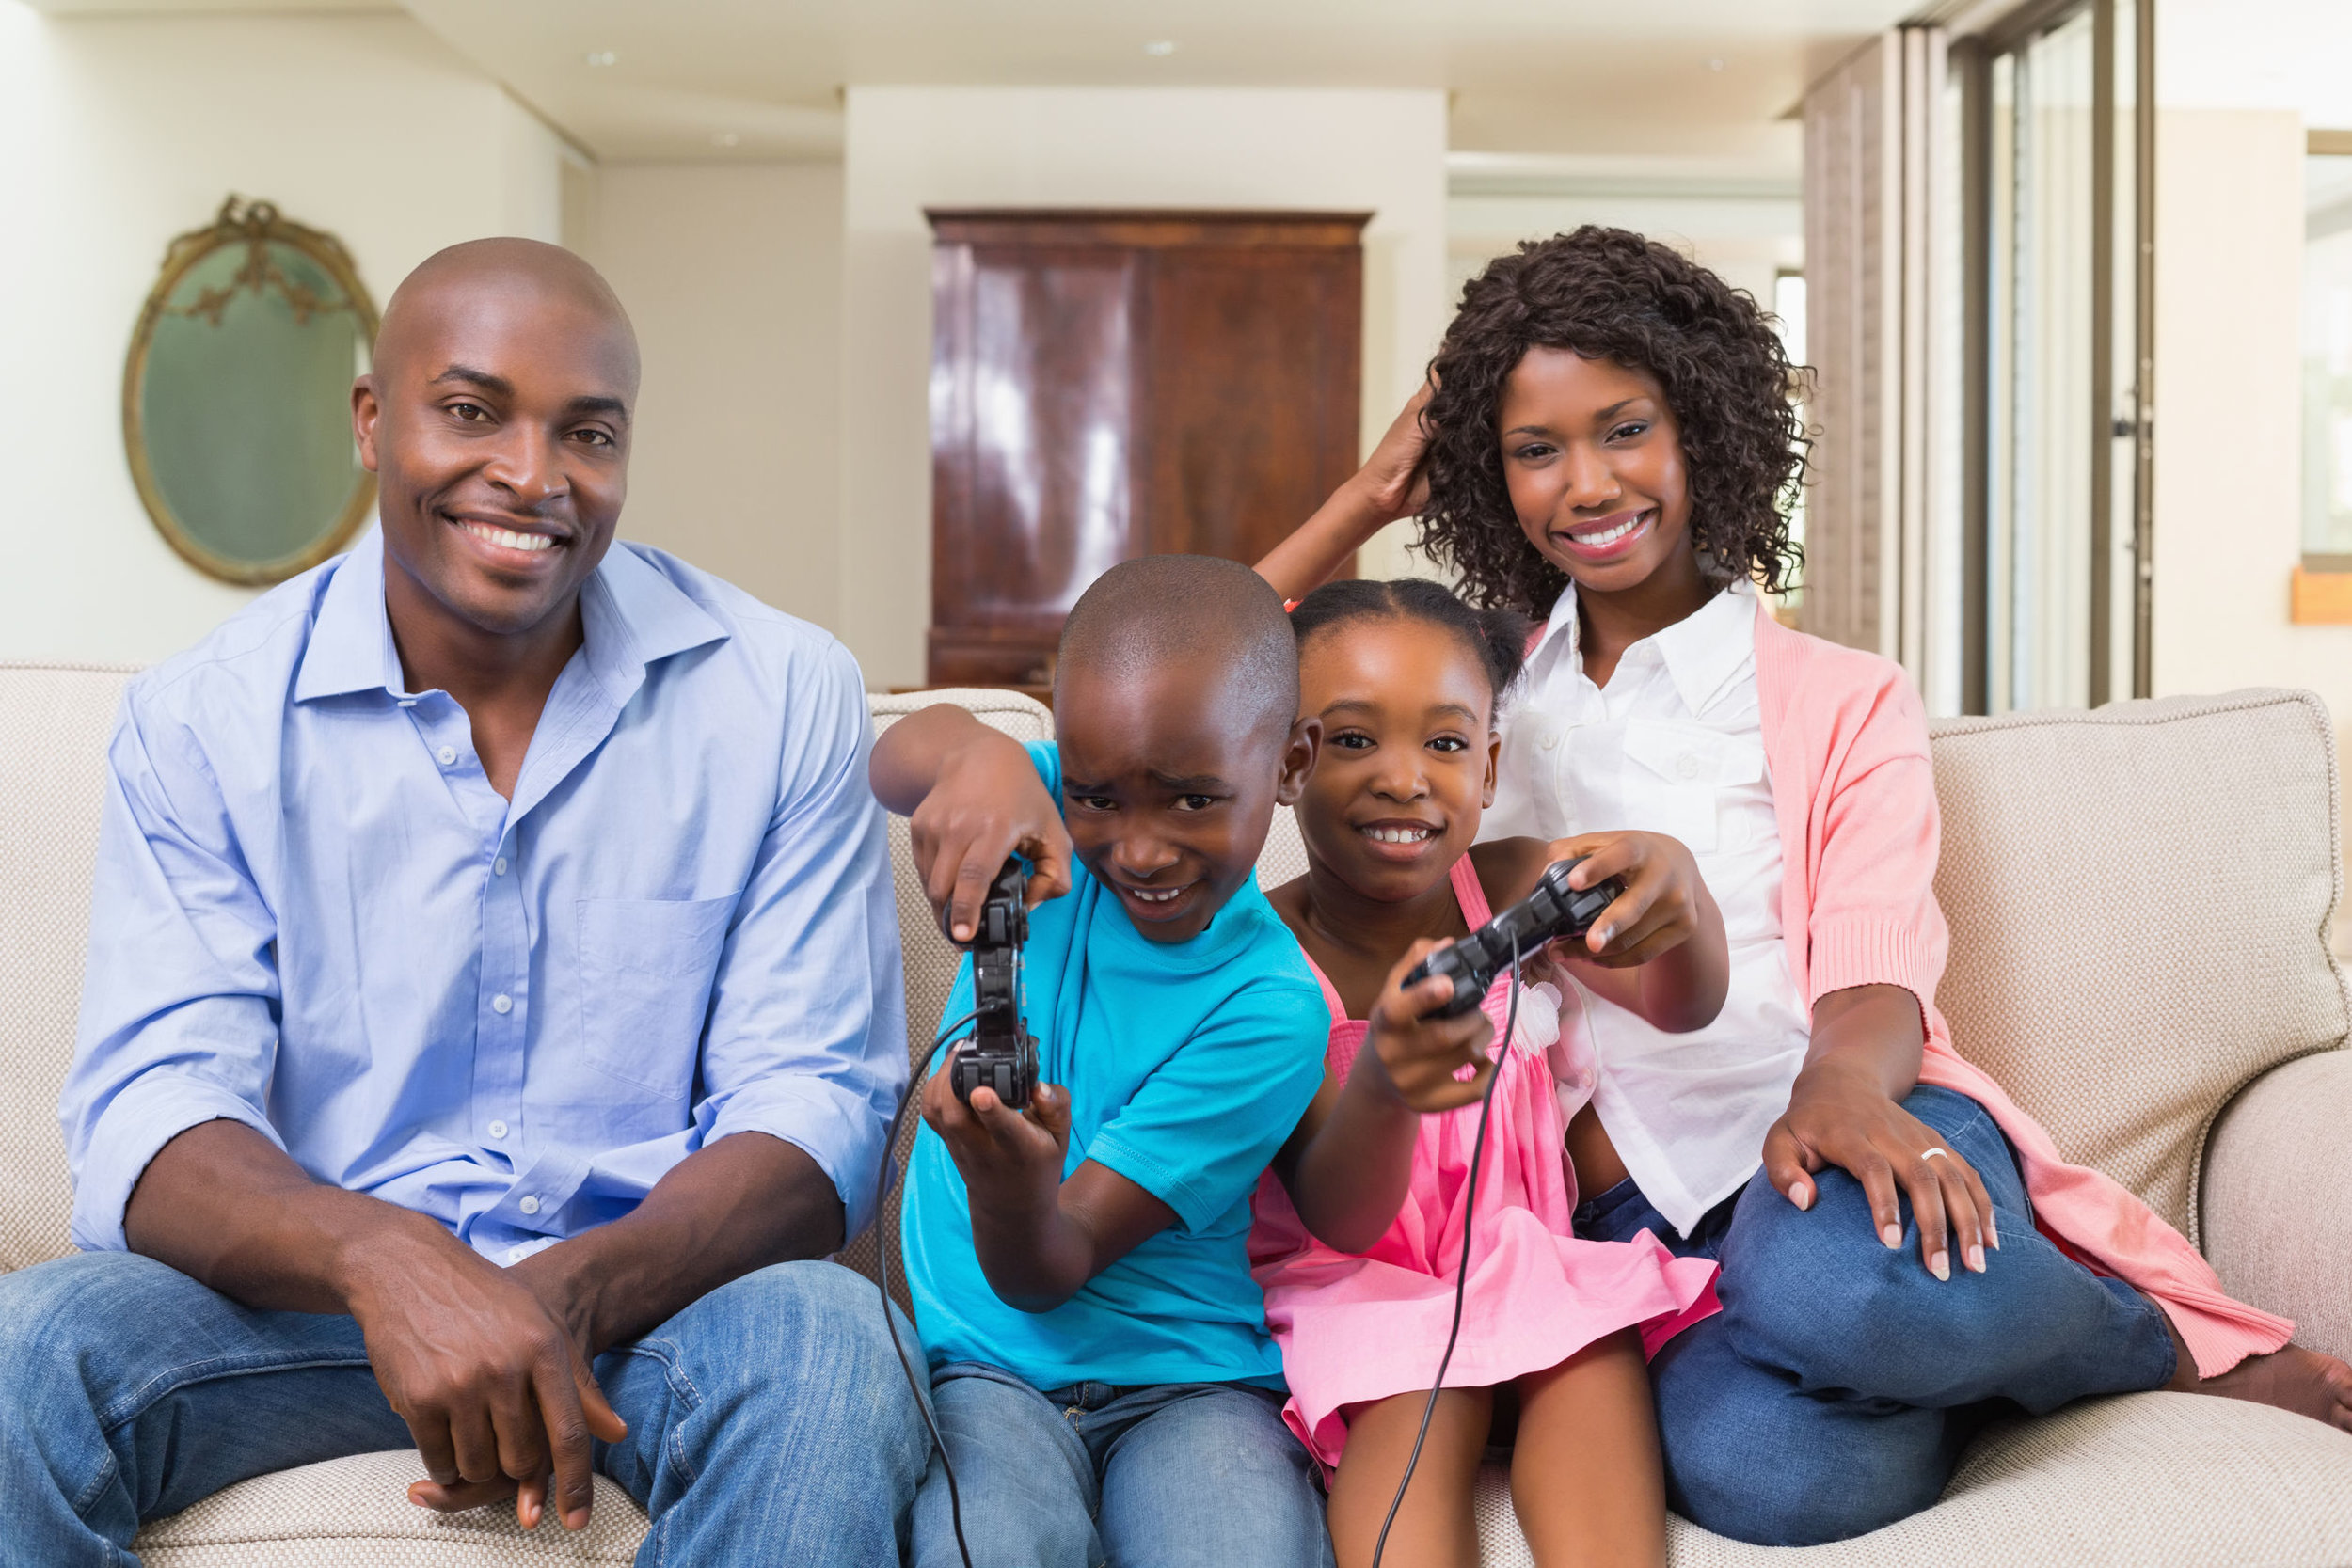 blackkidsandfamilyplayinggames.jpg